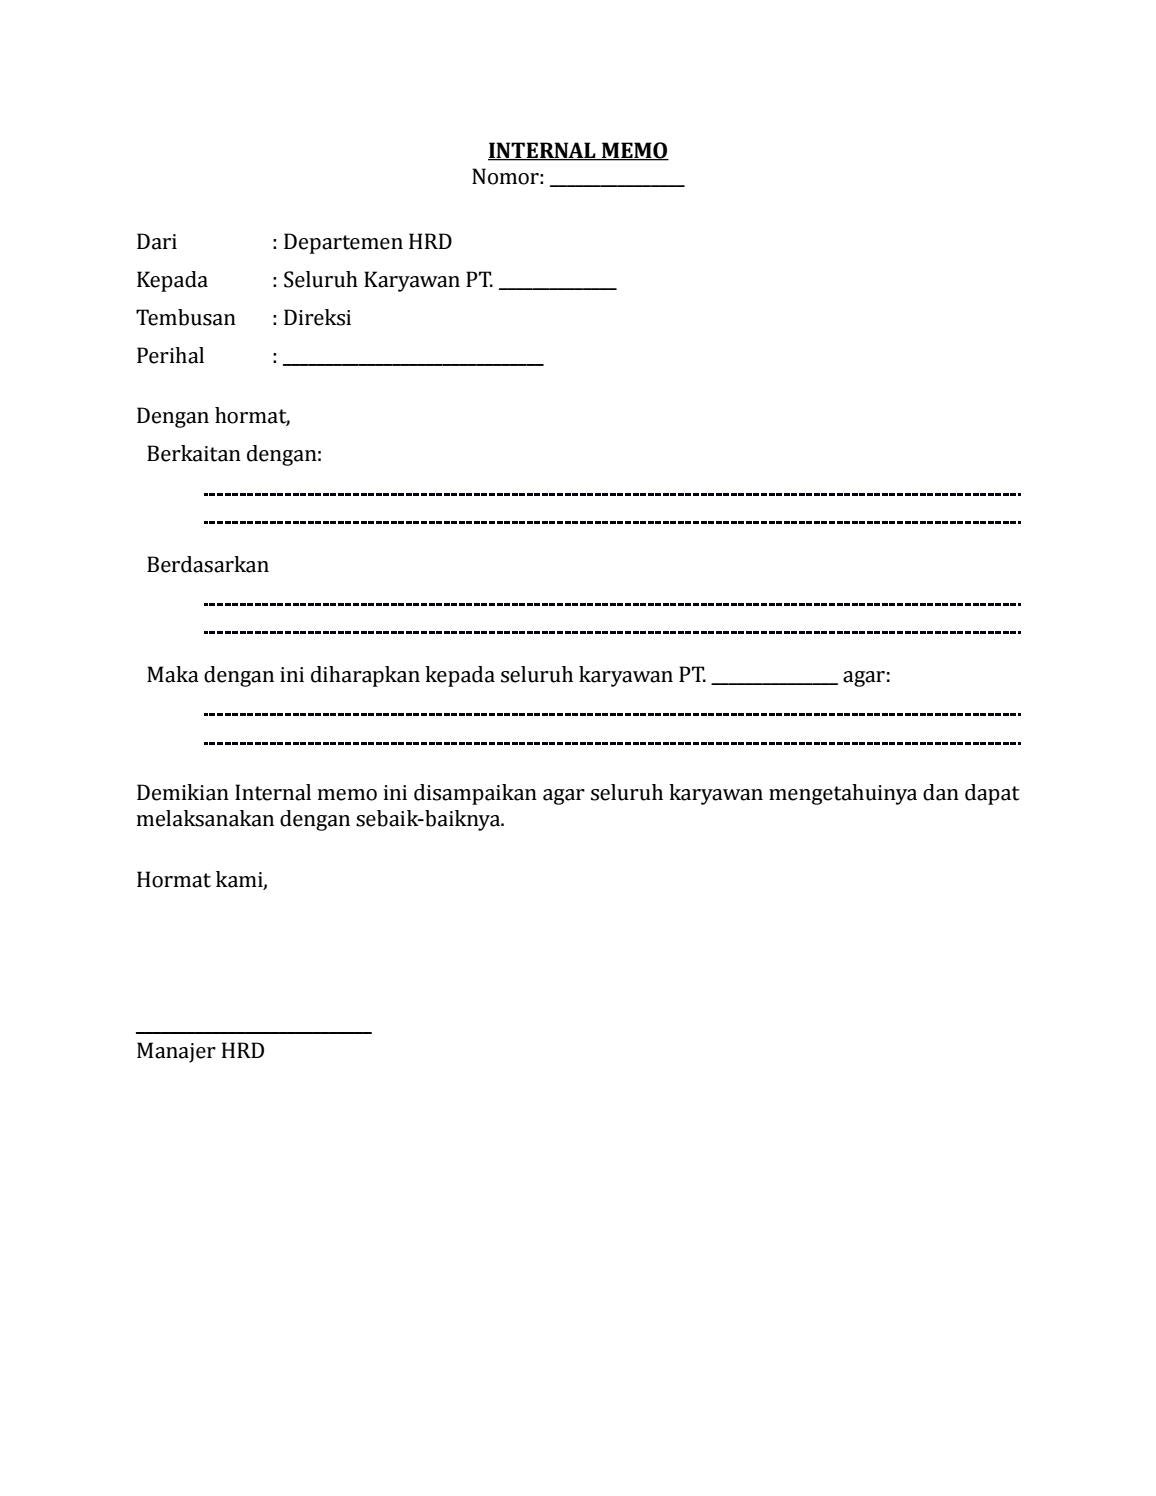 17 Draf Surat Internal Memo Surat Edaran Hrd By Arif